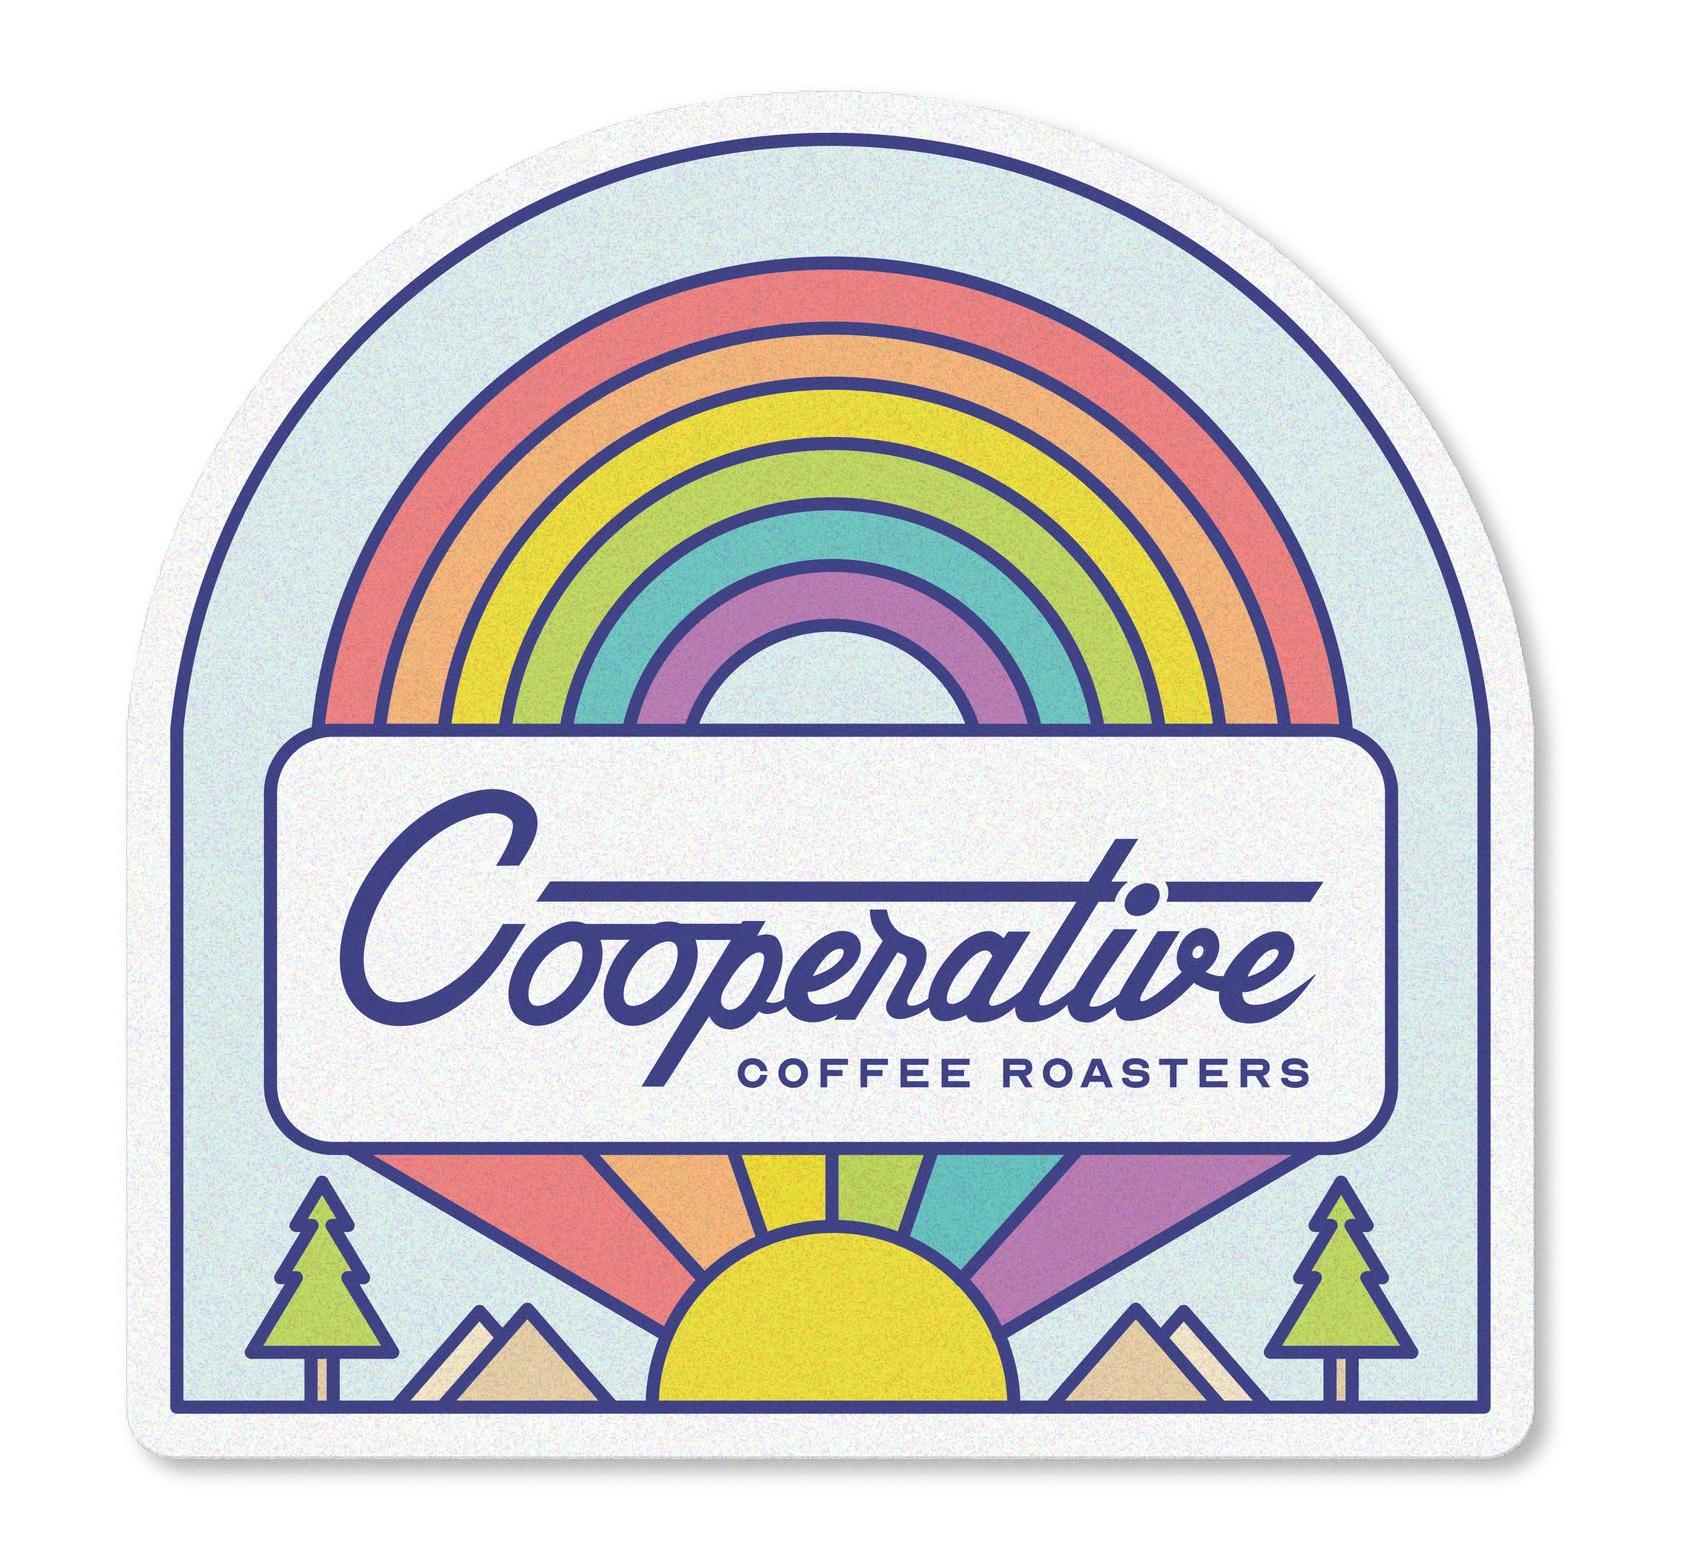 CCR_LogoAlt_07+-+Cooperative+Coffee+Roasters+%281%29.jpg